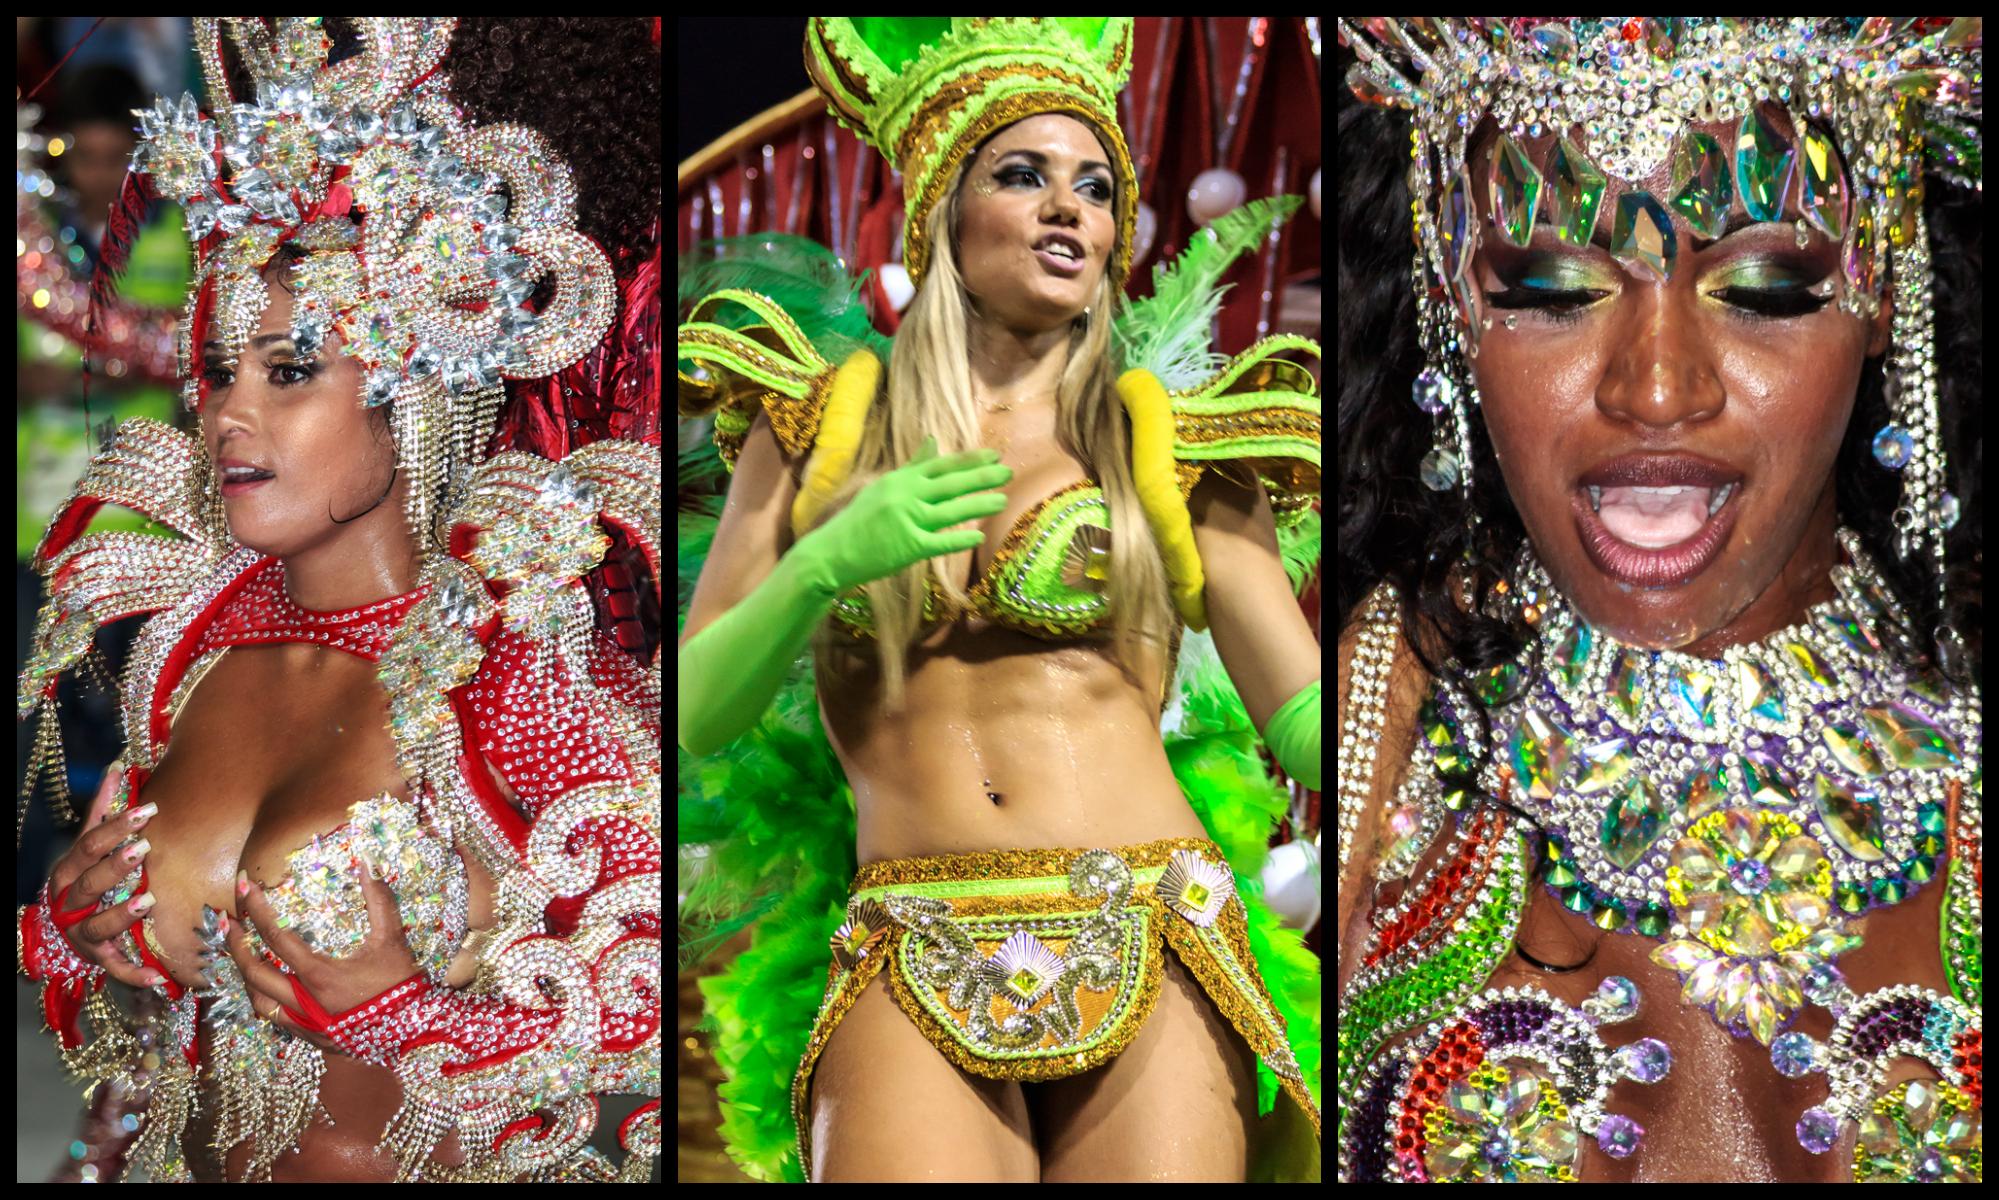 carnaval_005_inma_serrano_esparza